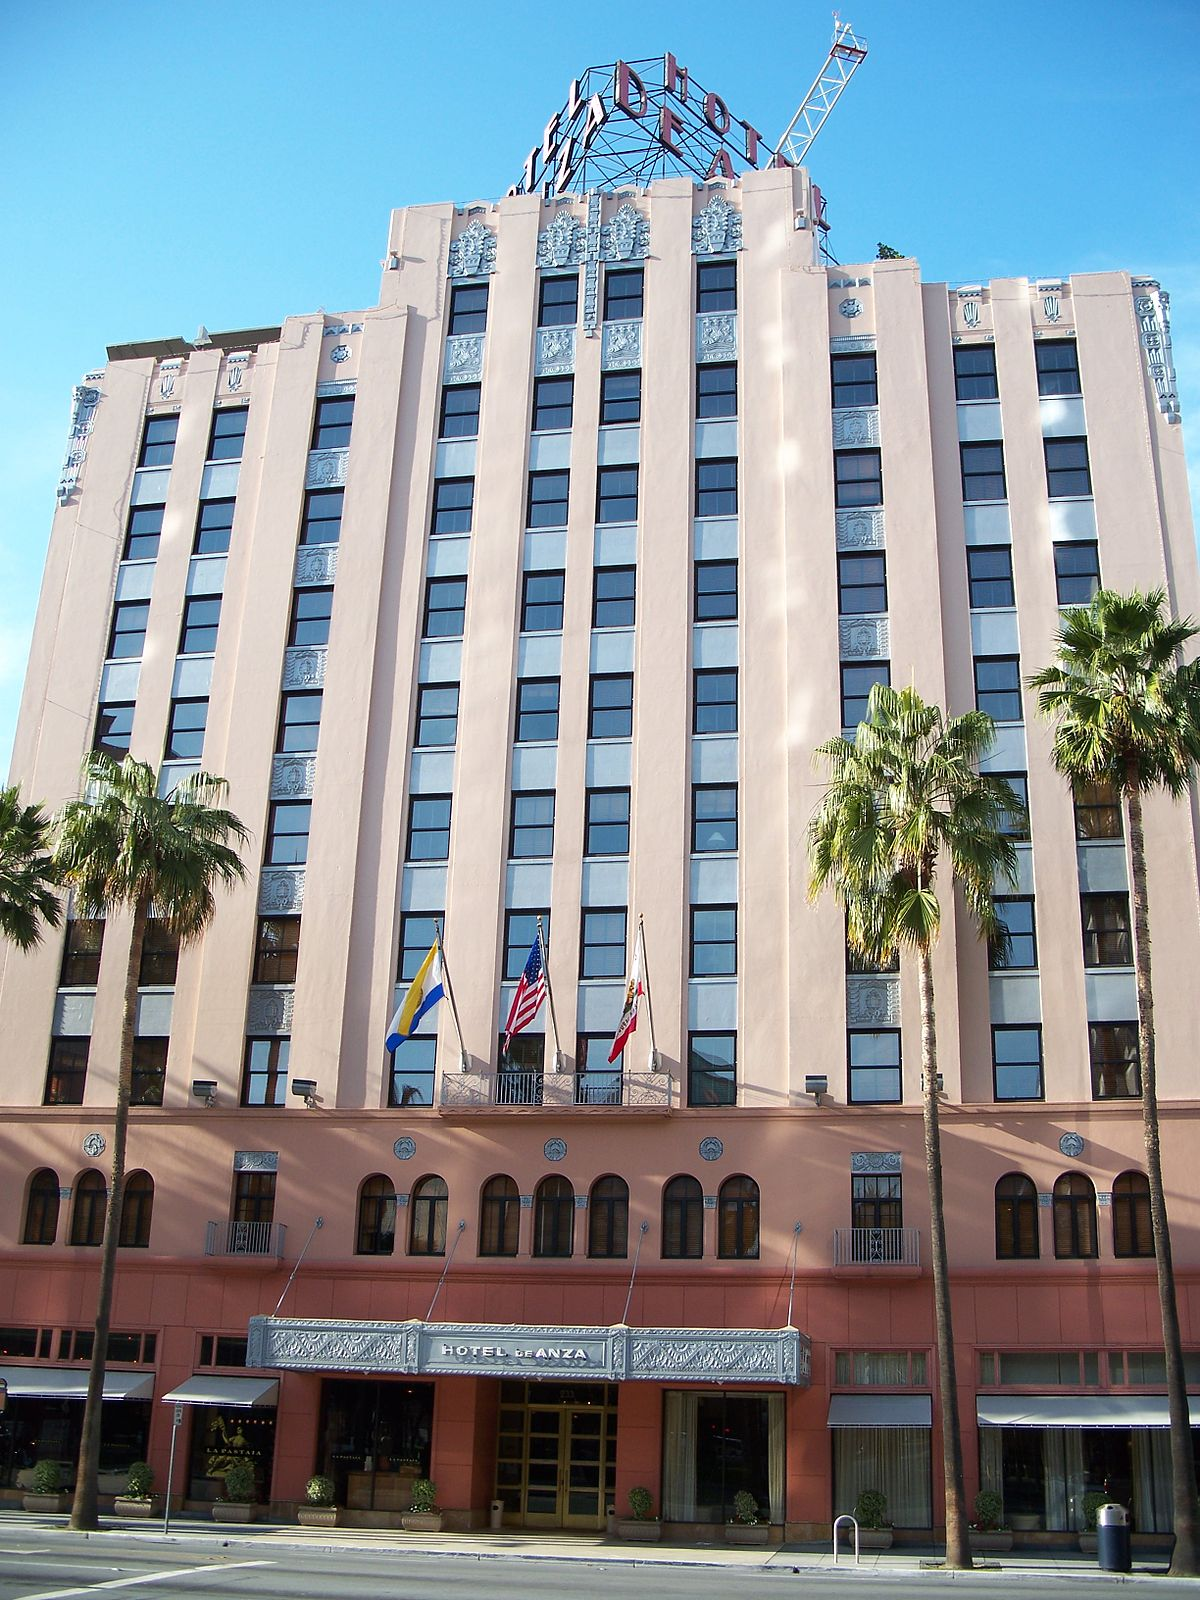 Hotel de anza wikipedia for Oldest hotels in america